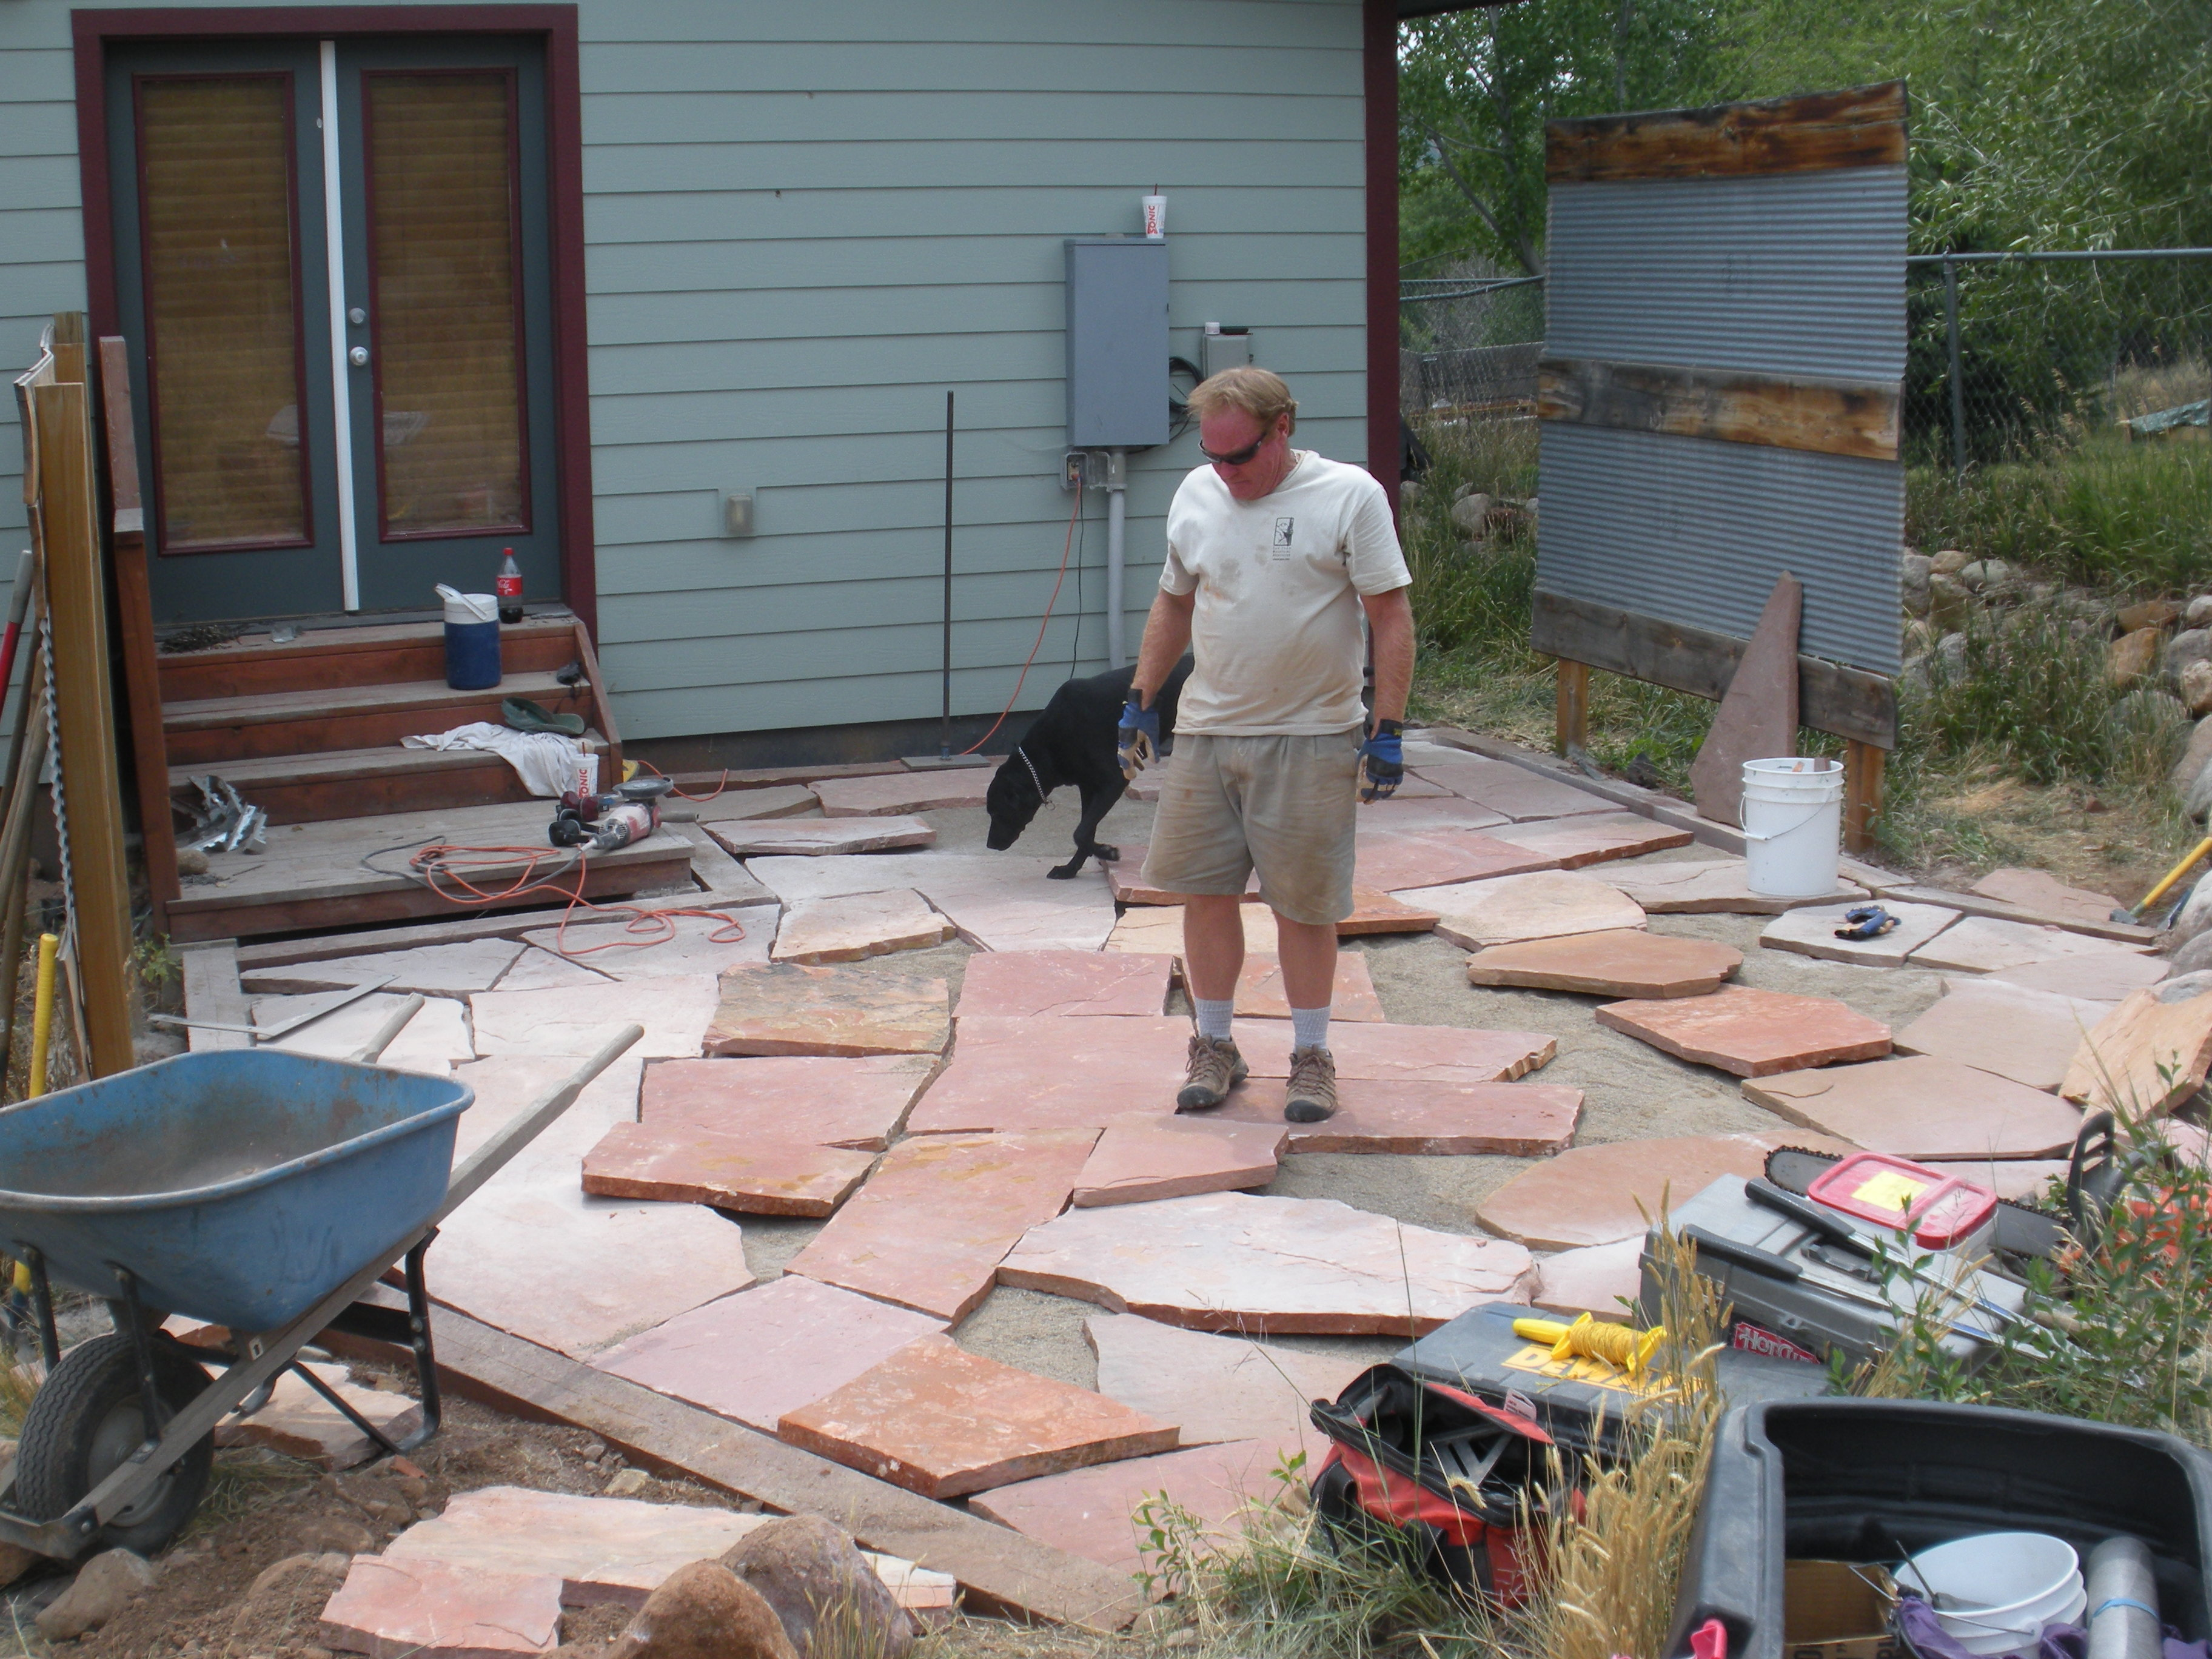 Durango Colorado Landscaper Gardenhart Installs Flagstone ... on Small Backyard Stone Patio Ideas id=72266